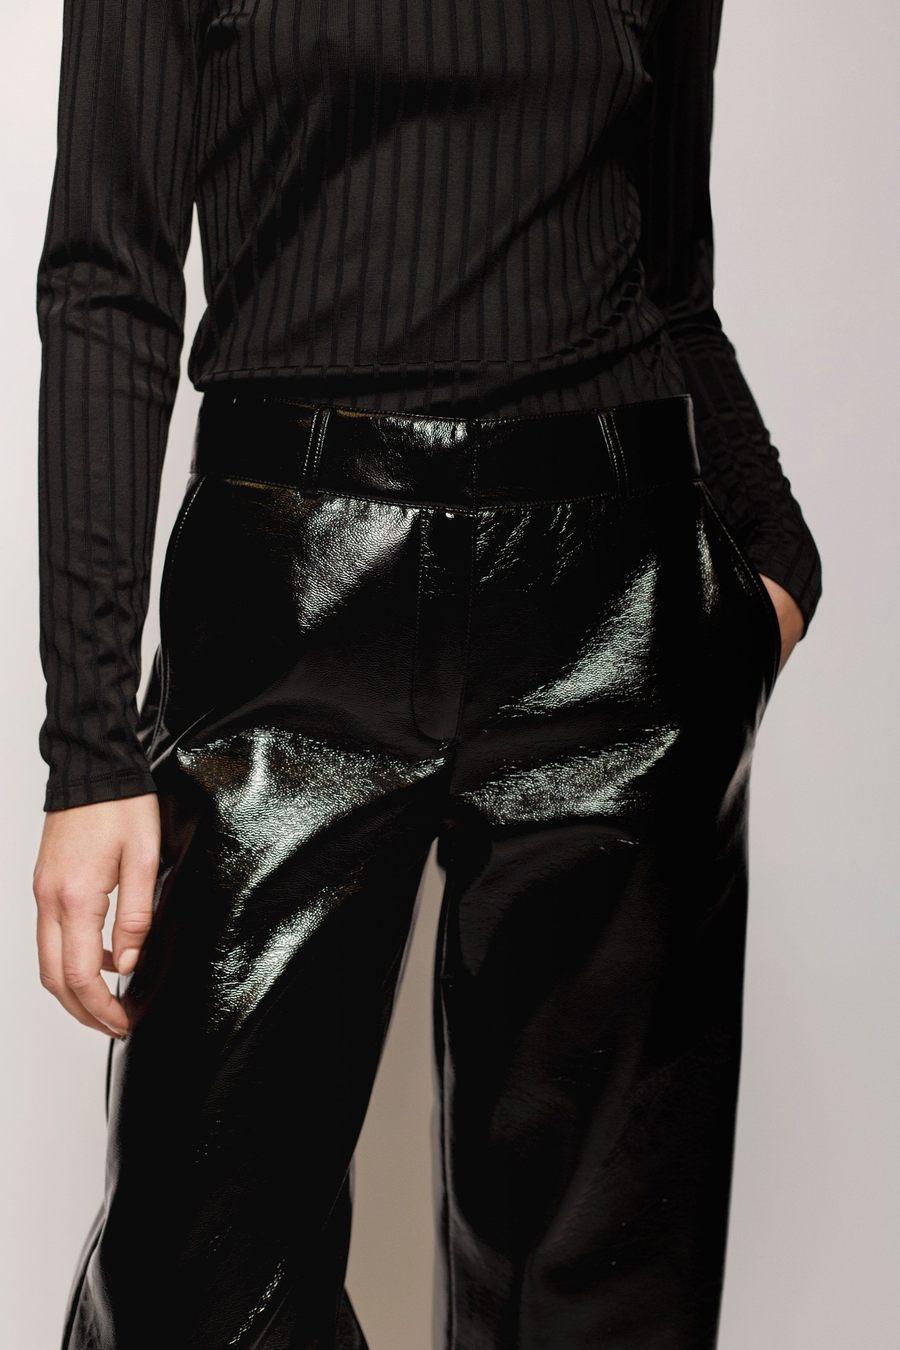 verde-trousers-black-trousers-stylein-404106_900x.jpg